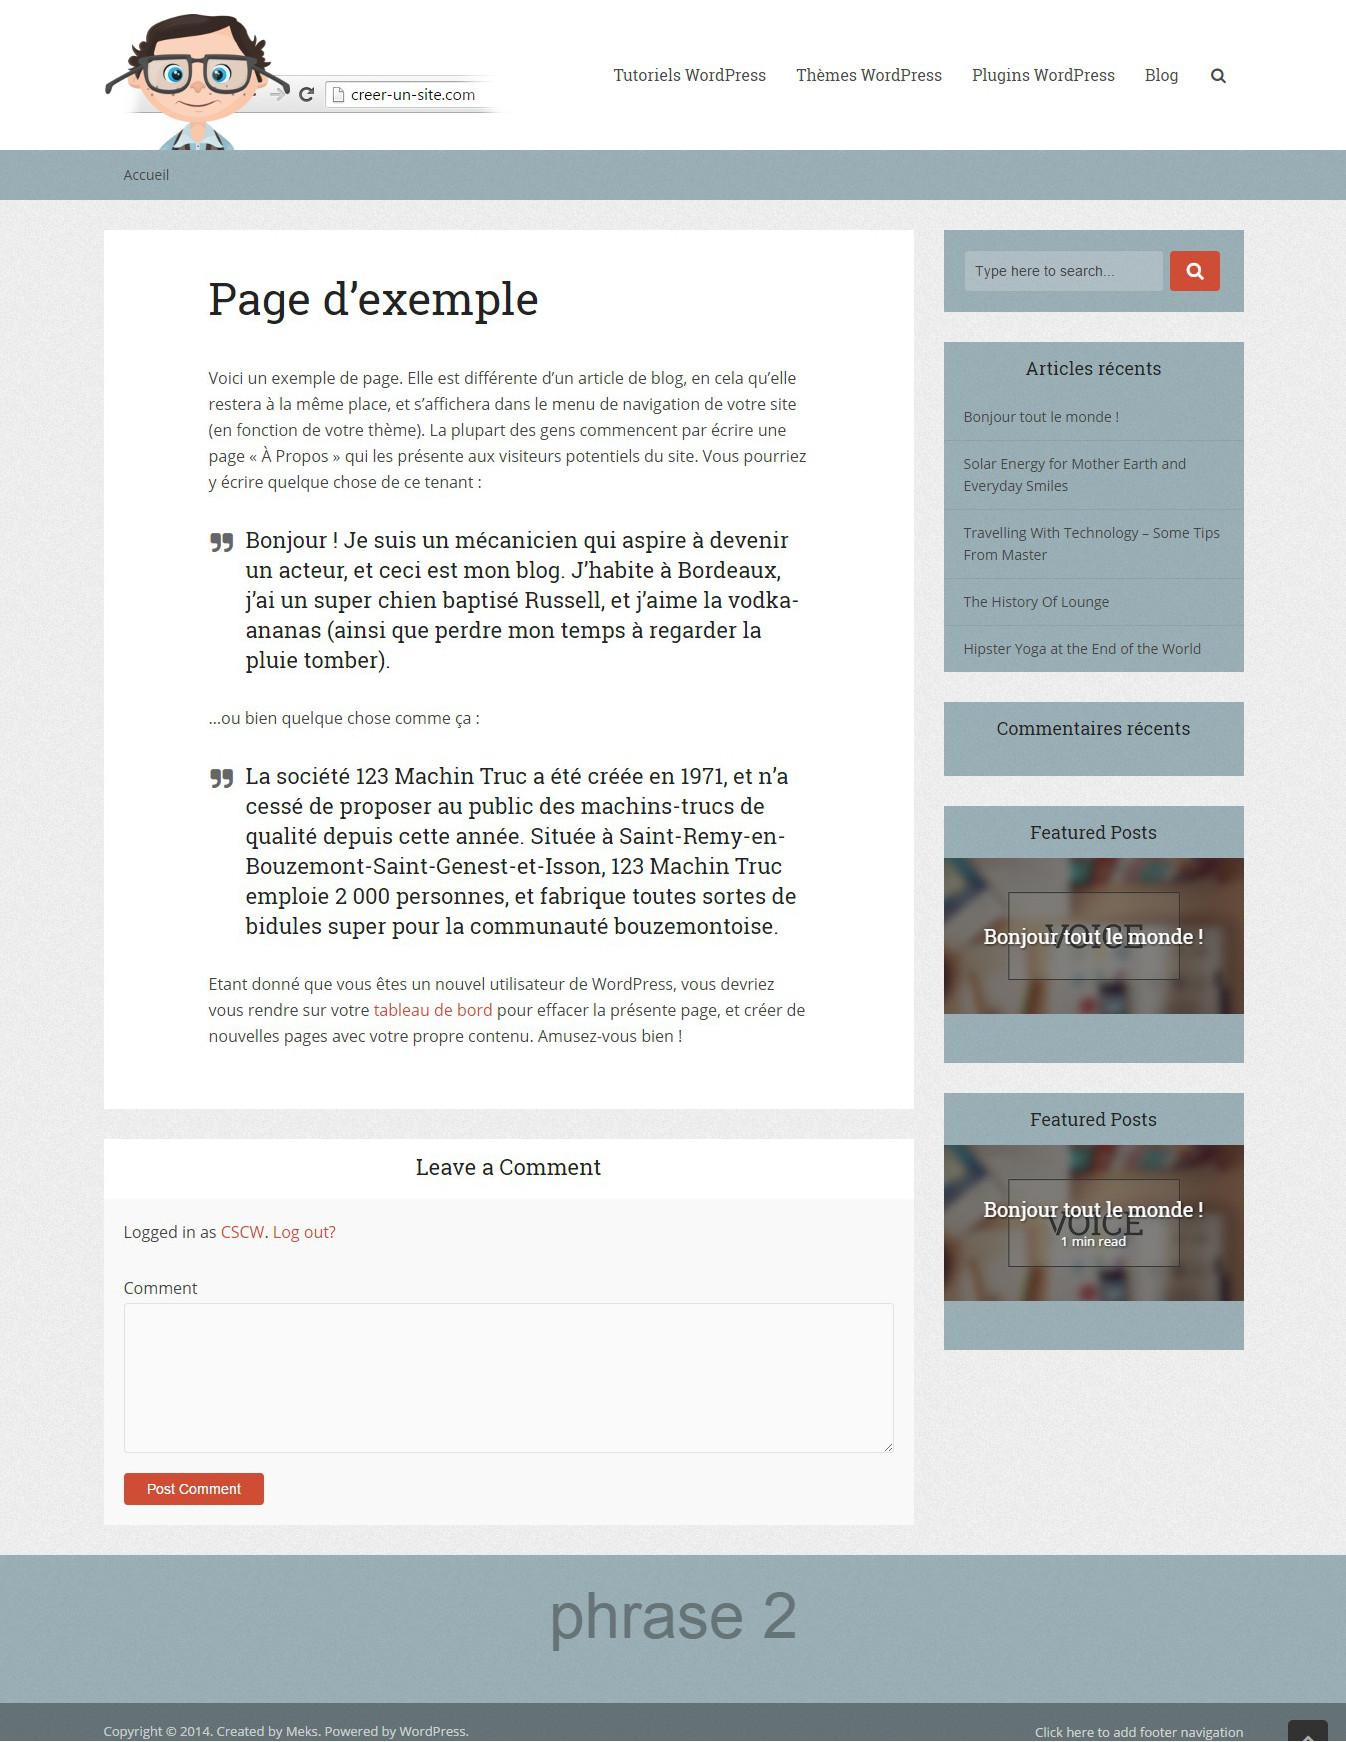 personnalisation theme wordpress resultat final